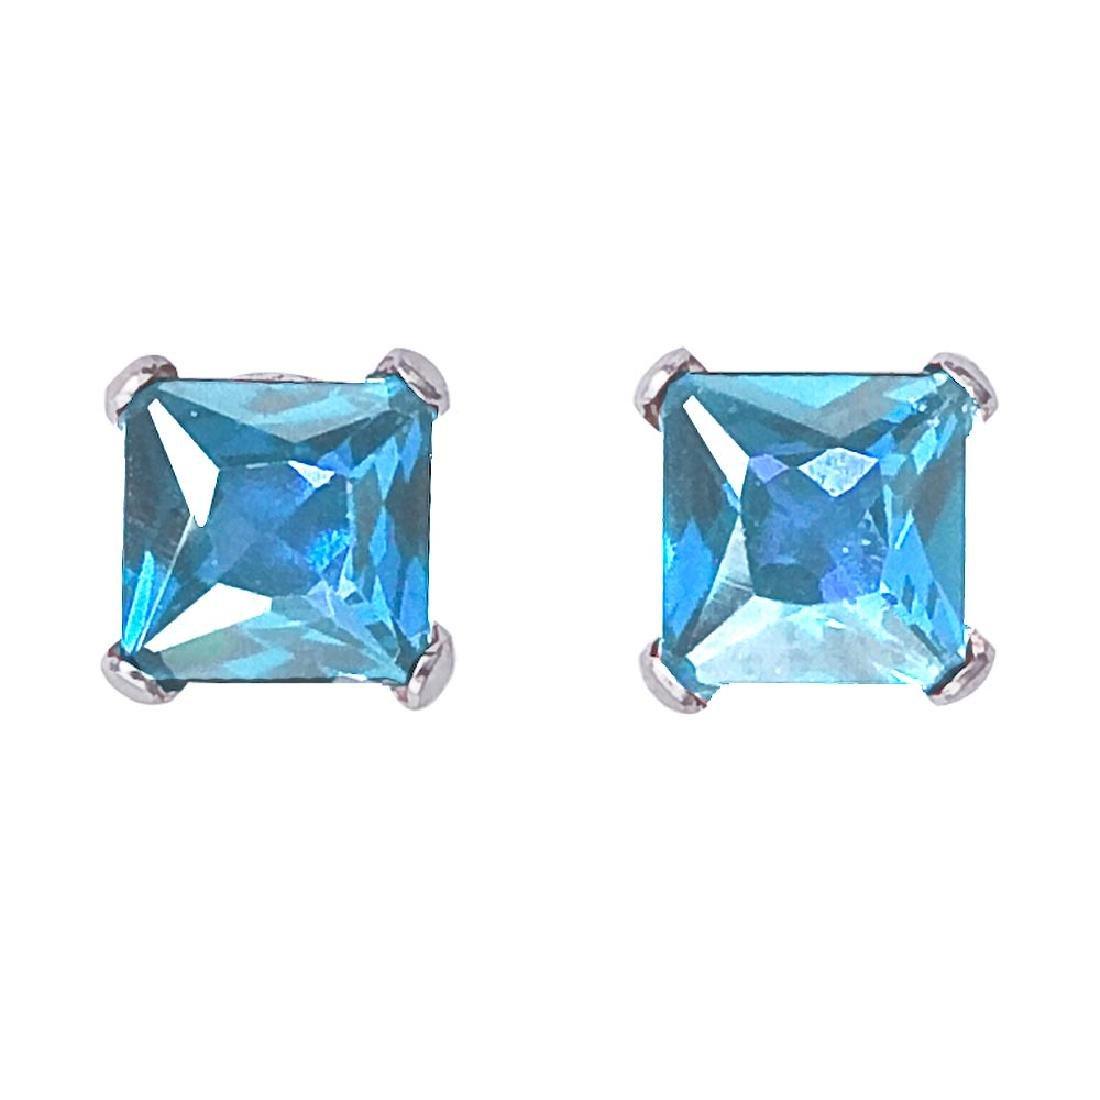 Certified 14k White Gold Square Blue Topaz Stud Earring